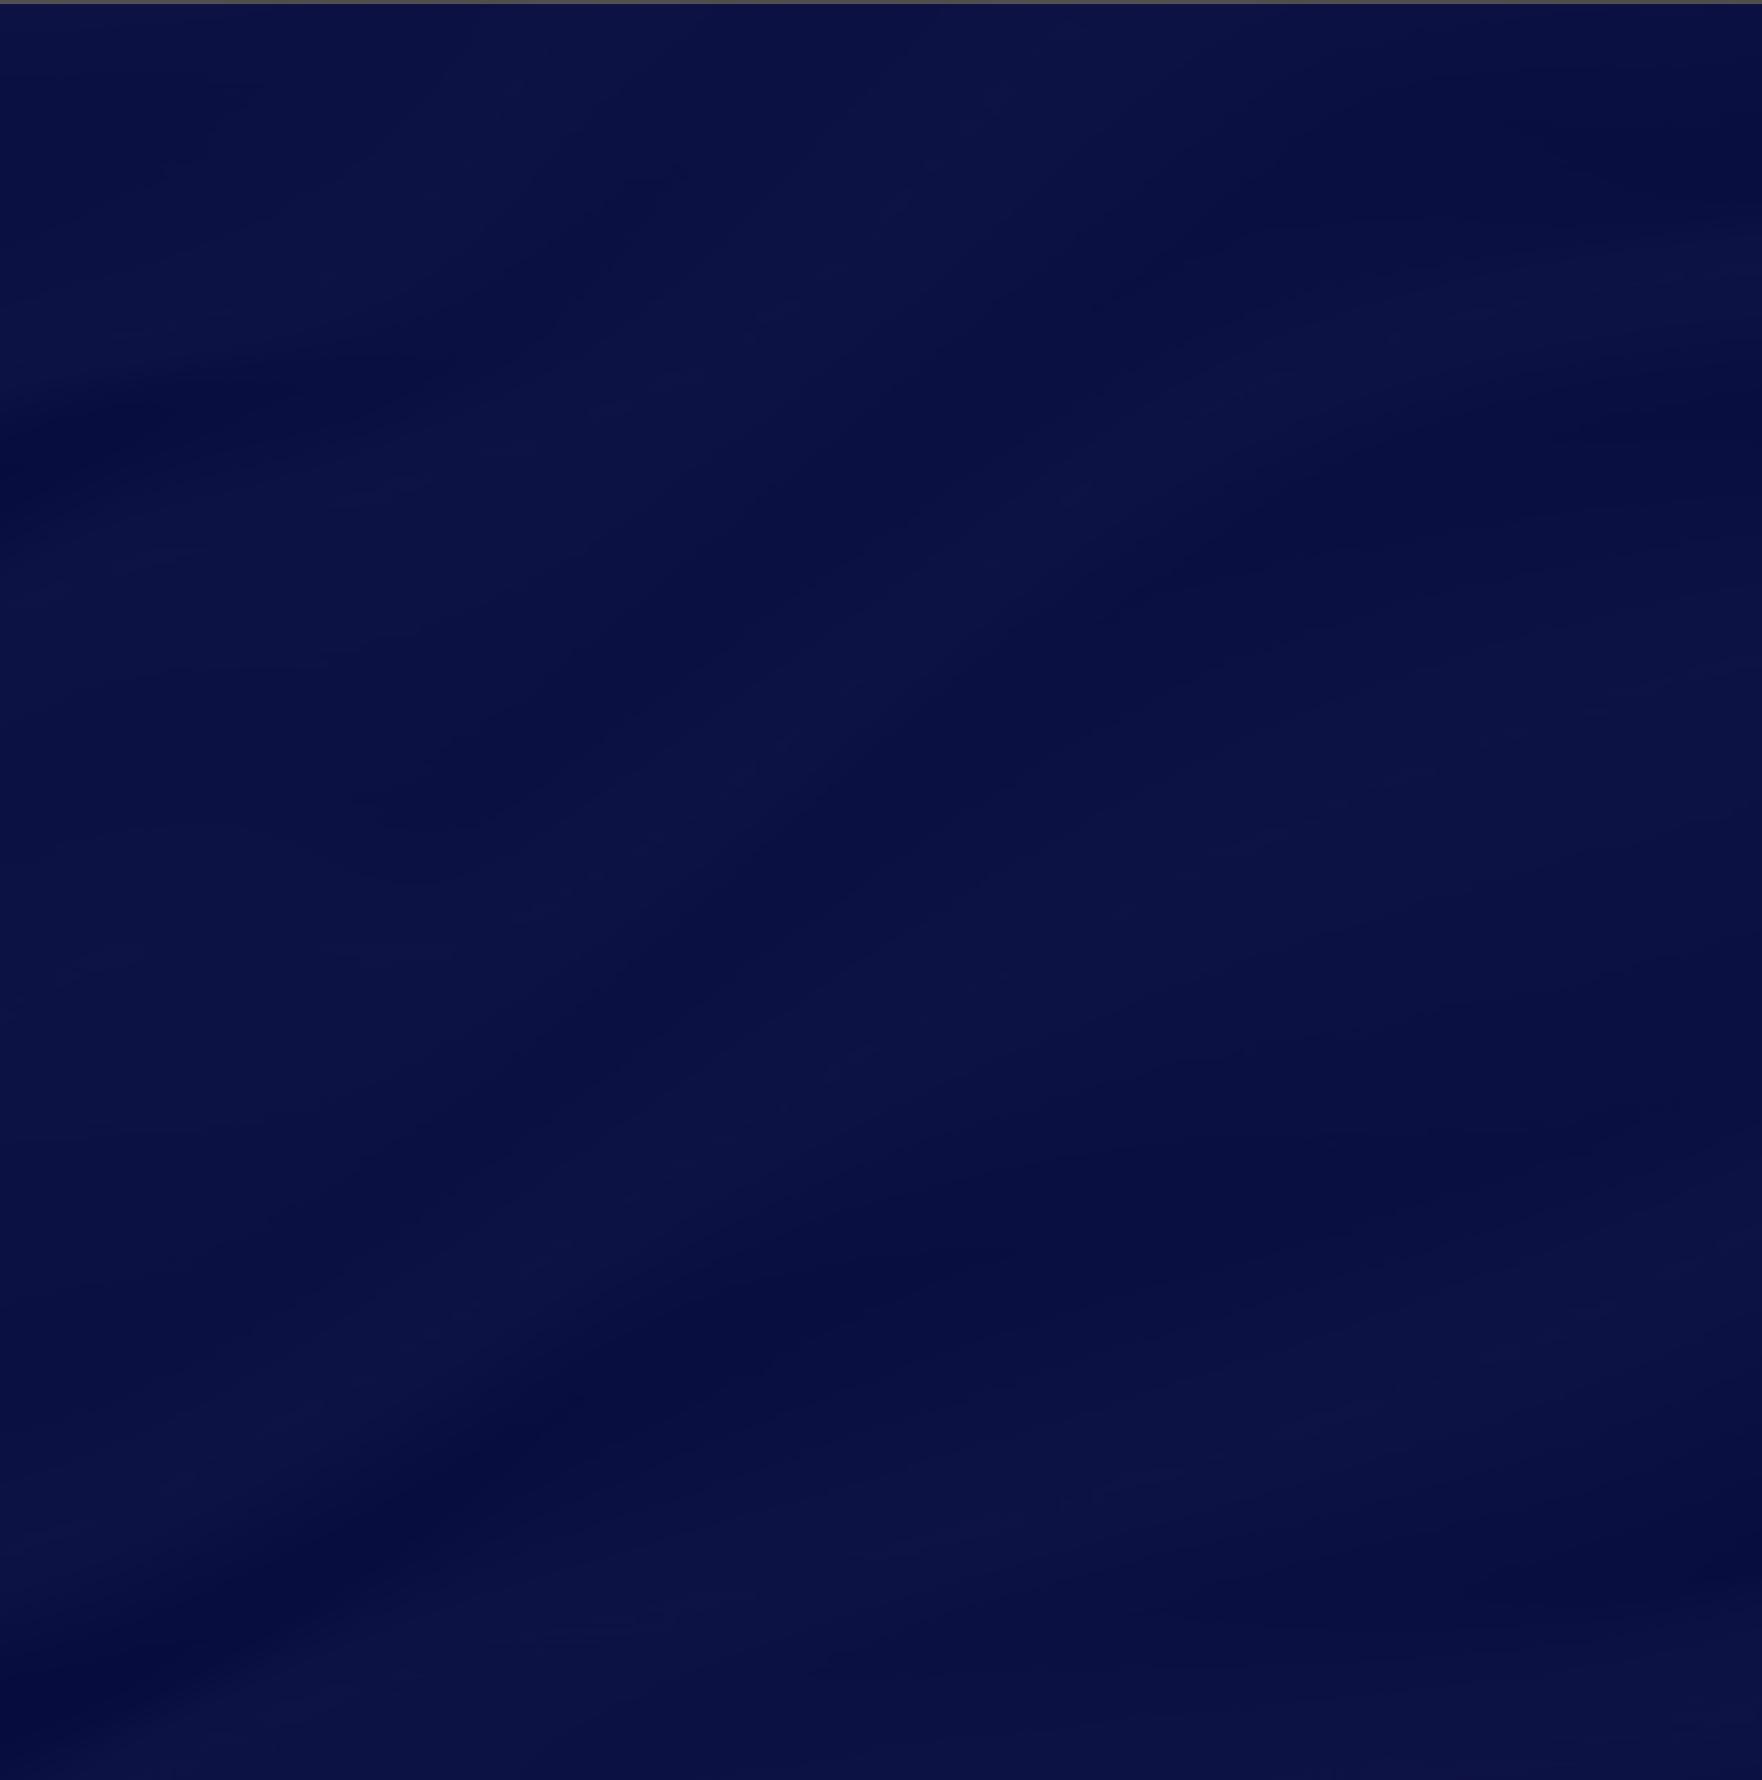 LISOX-191-TRICOLINE IPANEMA 100% ALGODAO MARINHO